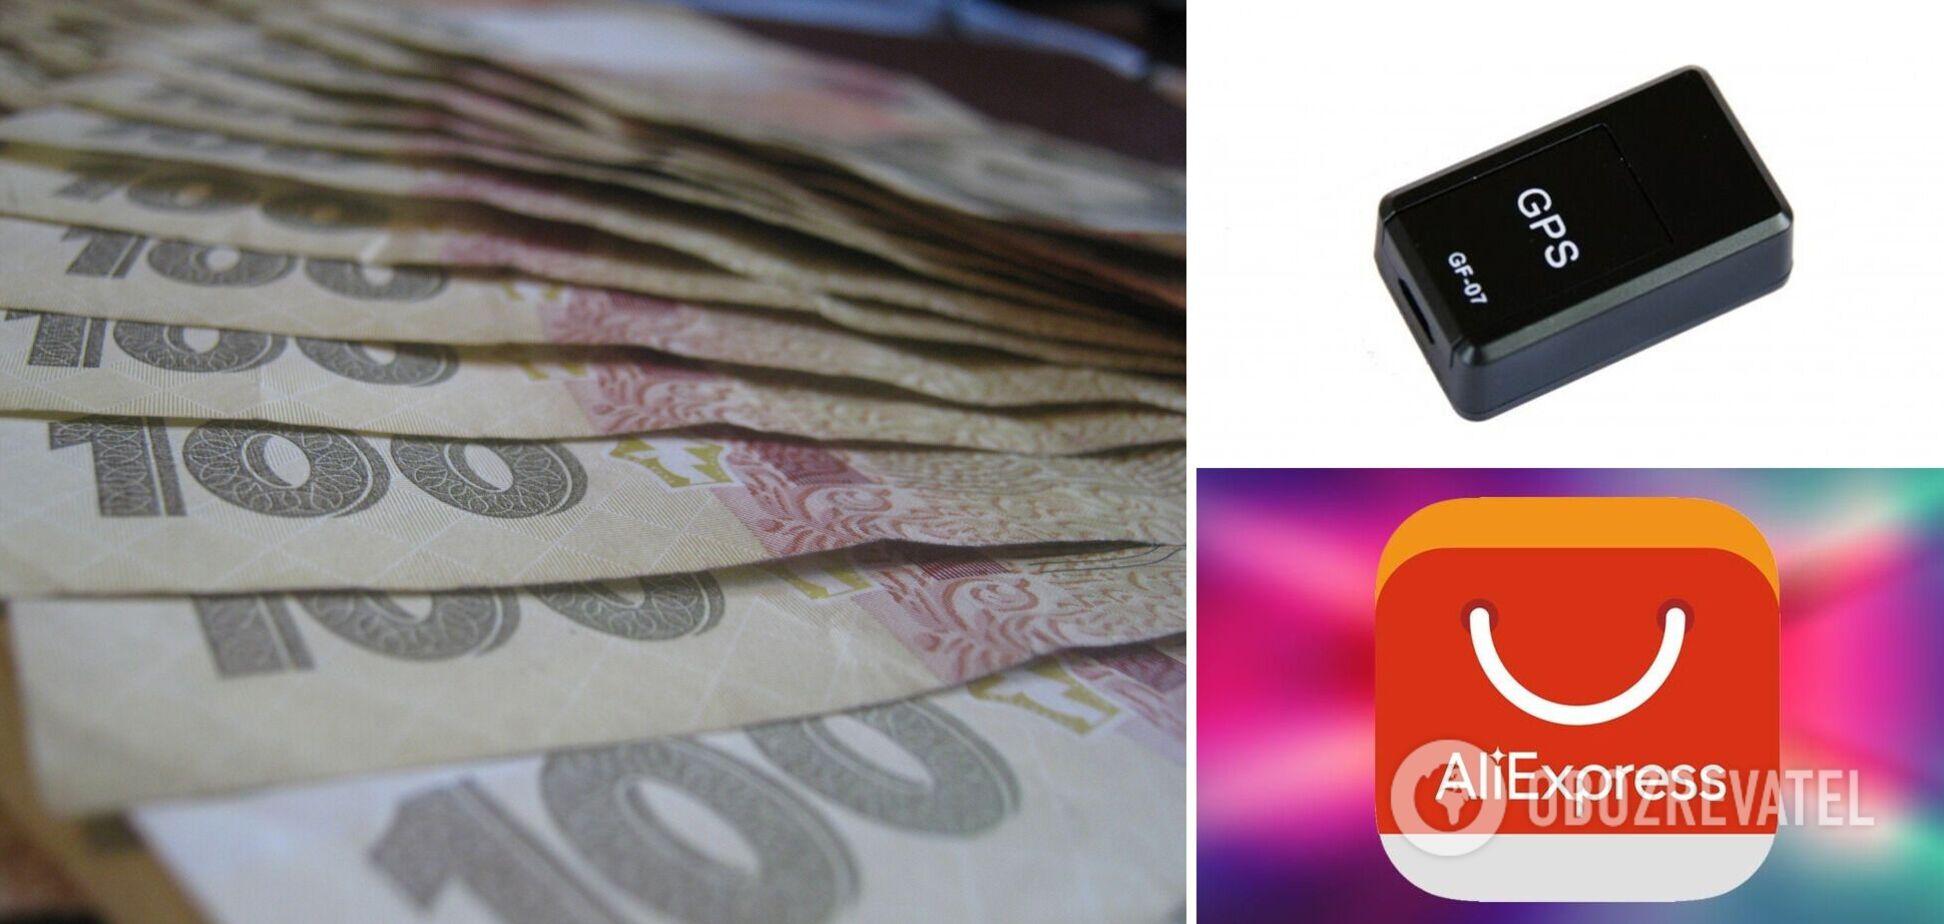 Українця оштрафували на 850 грн за куплений на AliExpress GPS-трекер